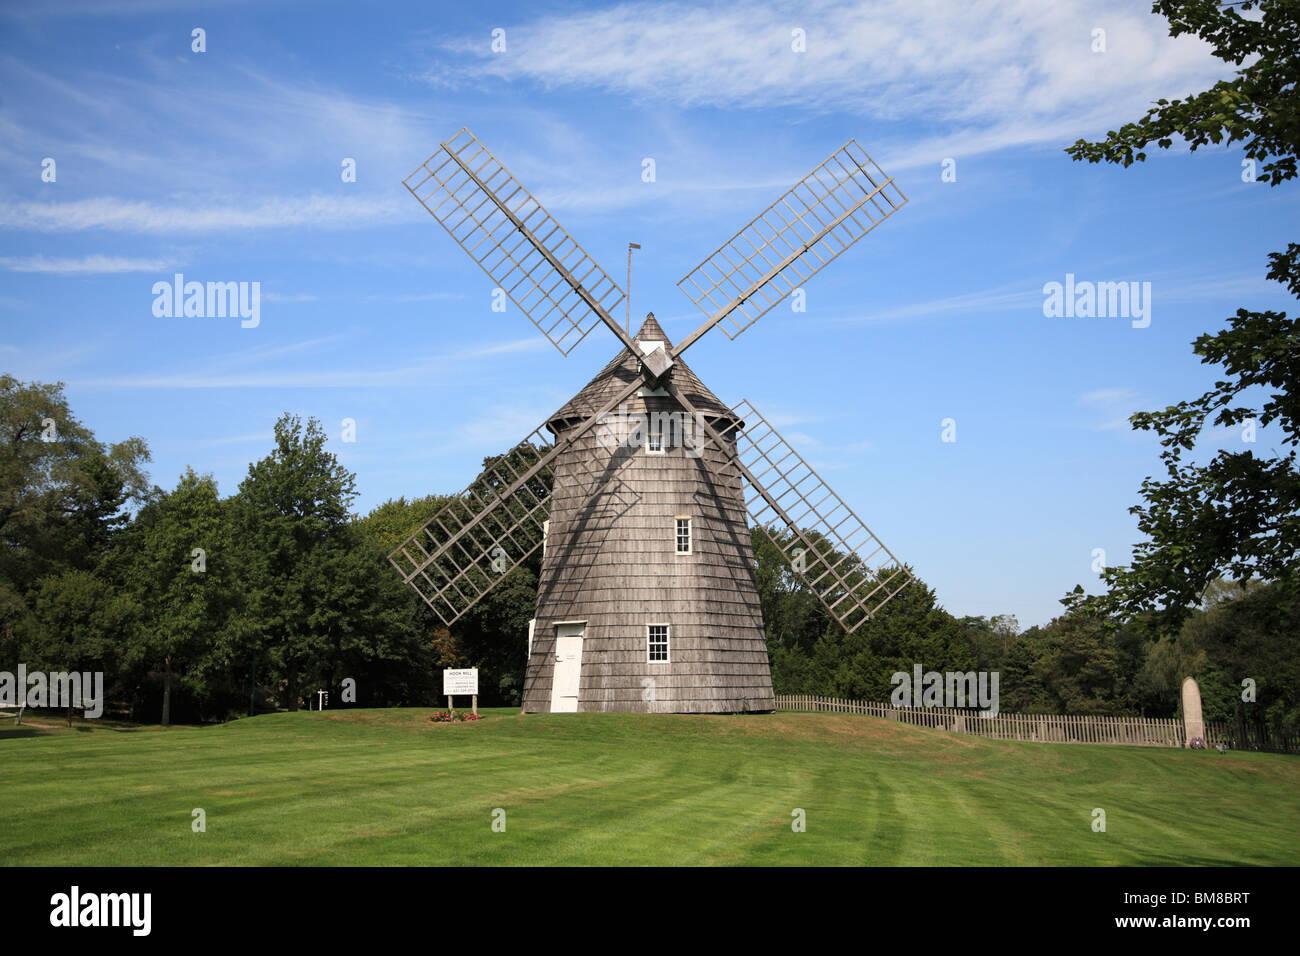 Old Hook Windmill, East Hampton, The Hamptons, Long Island, New York, USA - Stock Image